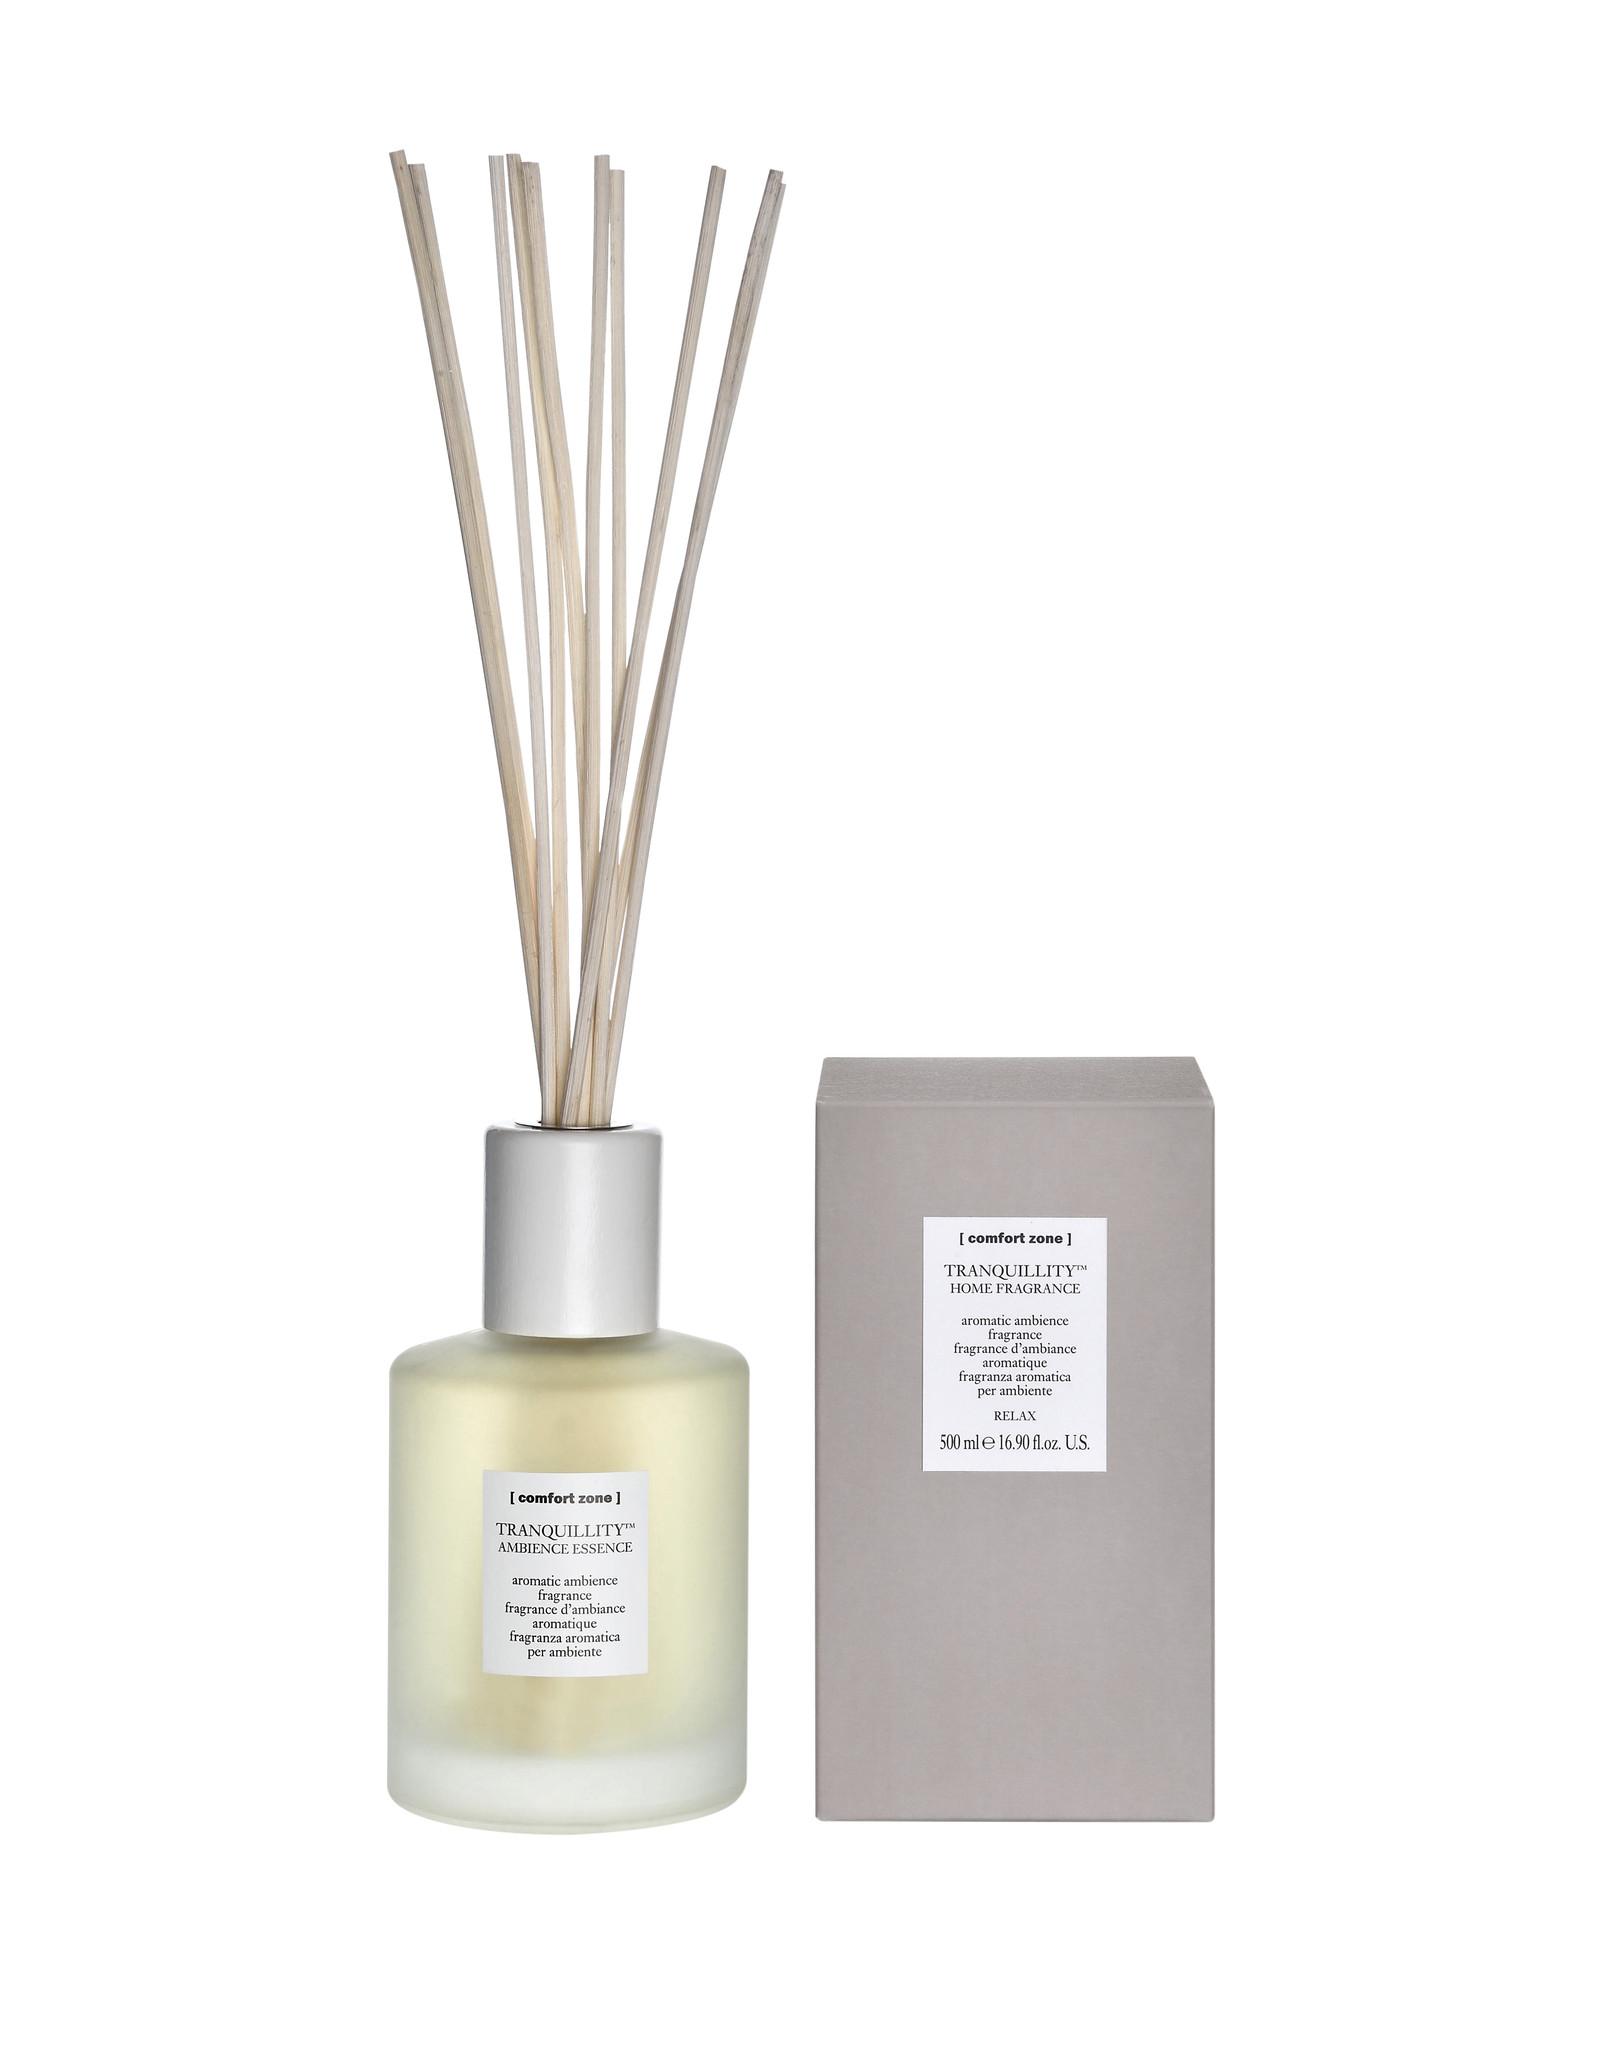 [Comfort Zone] Tranquillity Bamboo Sticks  10 pcs